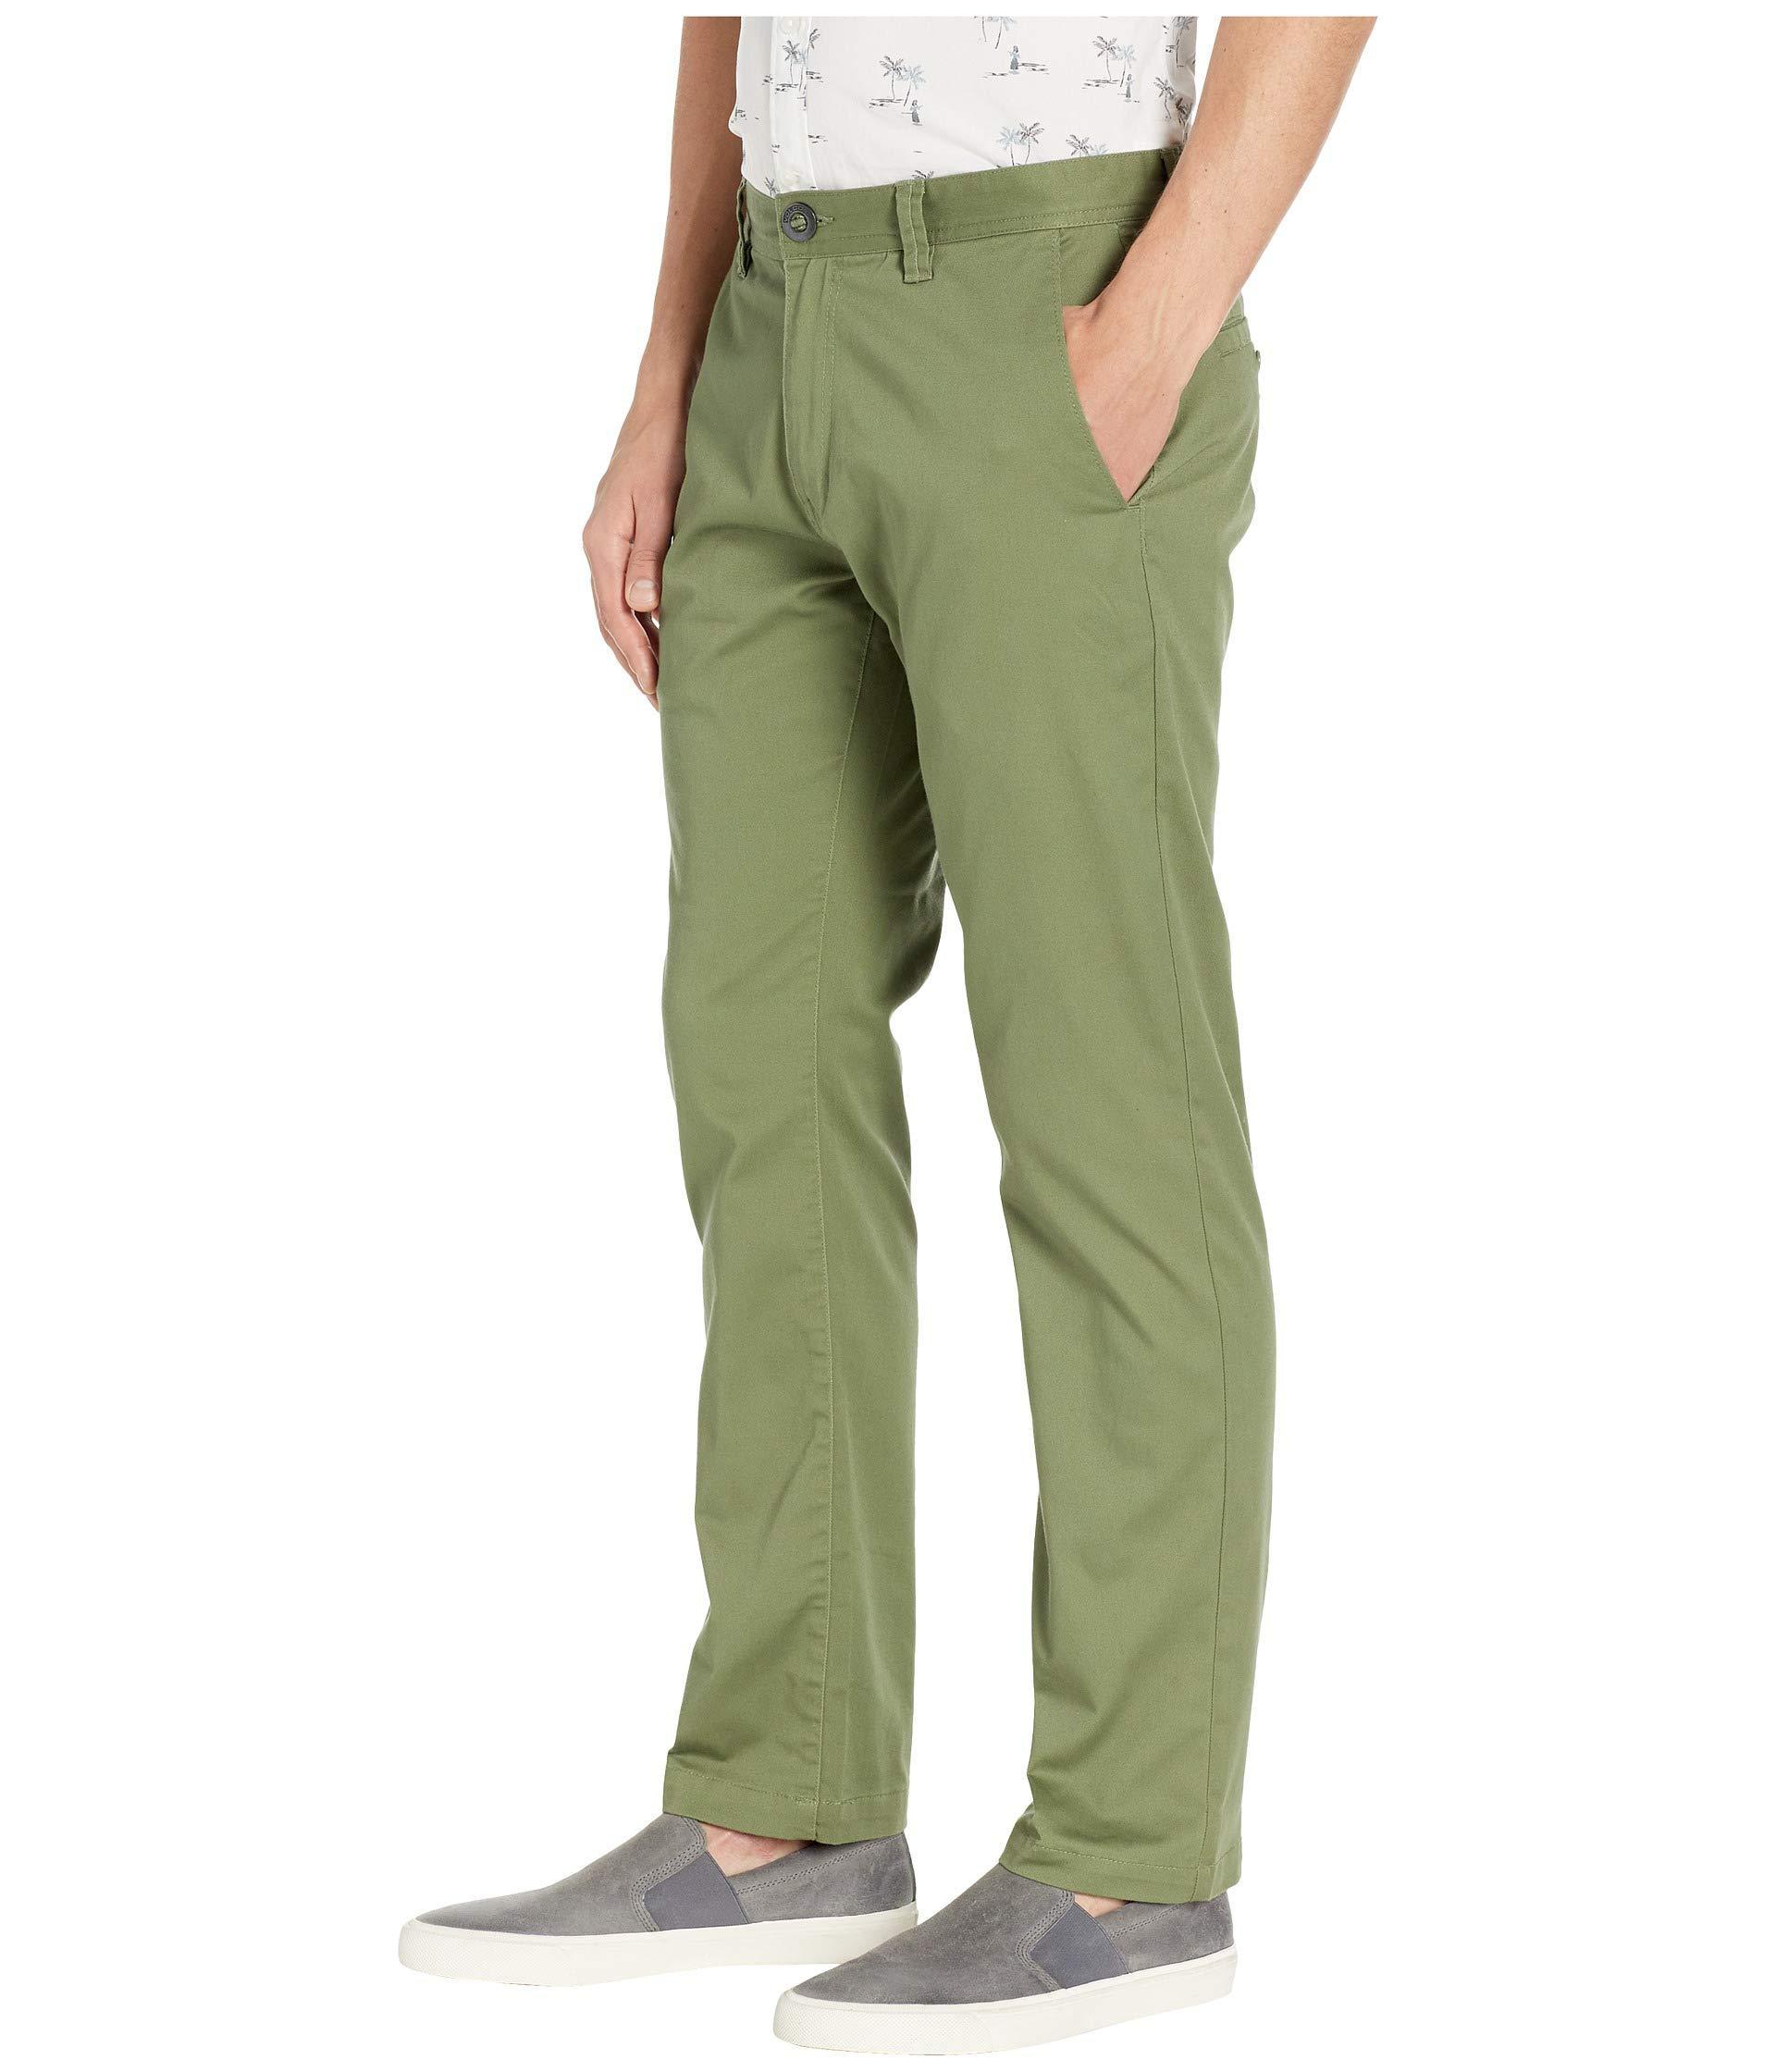 829eef505ee5f5 Lyst - Volcom Frickin Modern Stretch (black) Men's Casual Pants in Green  for Men